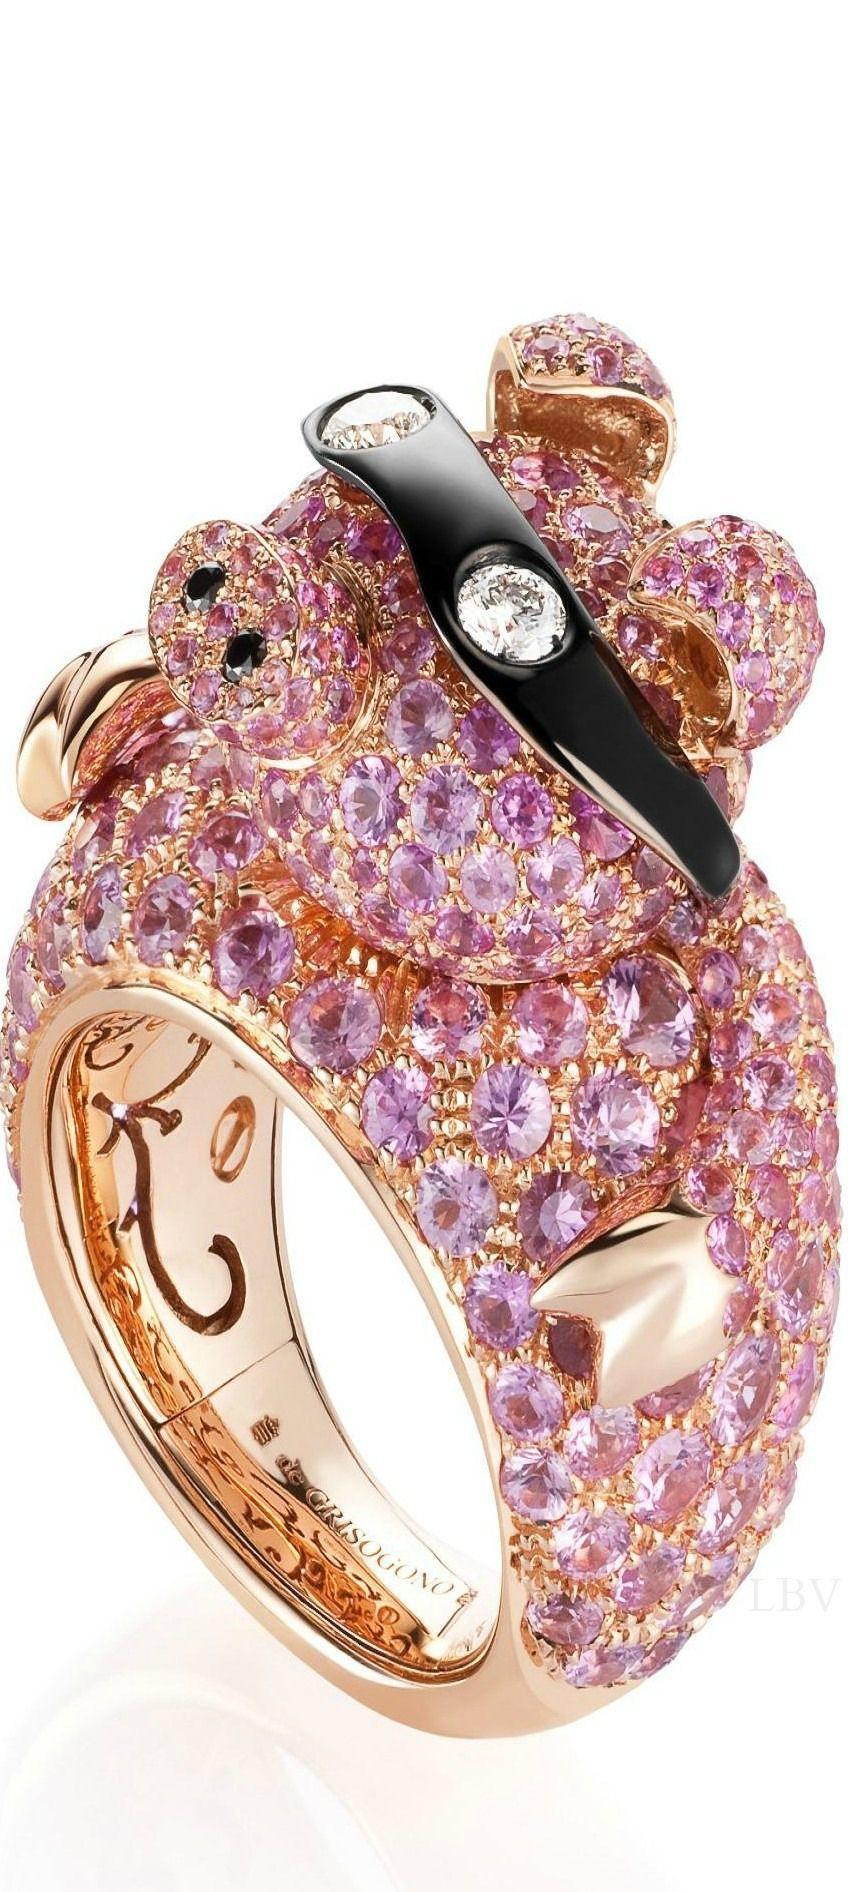 de Grisogono     Pitzotl   Pinterest   Pink ring, Ring and Jewel